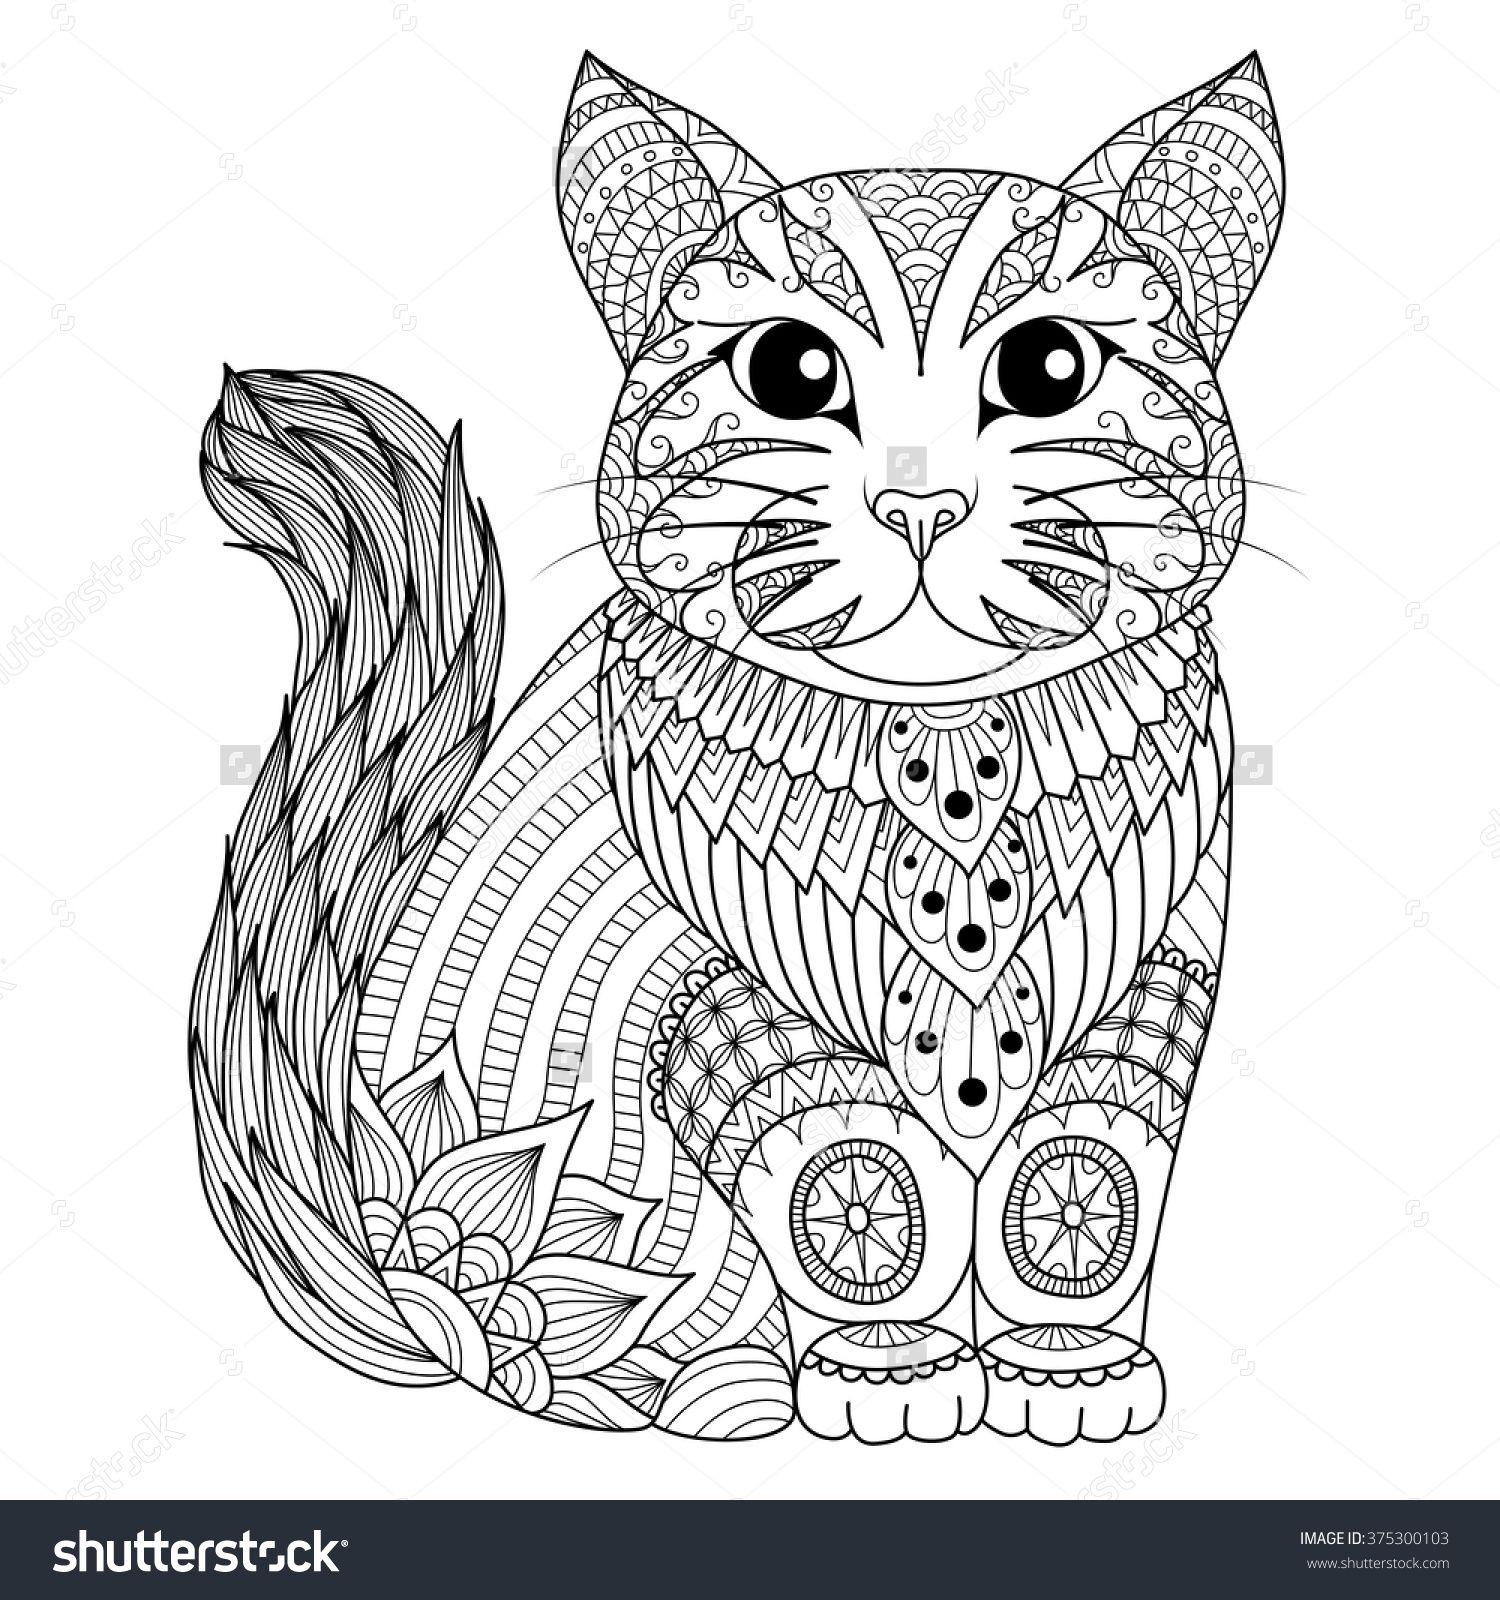 zentangle cat | Doodling | Pinterest | Cat, Adult coloring and Mandala